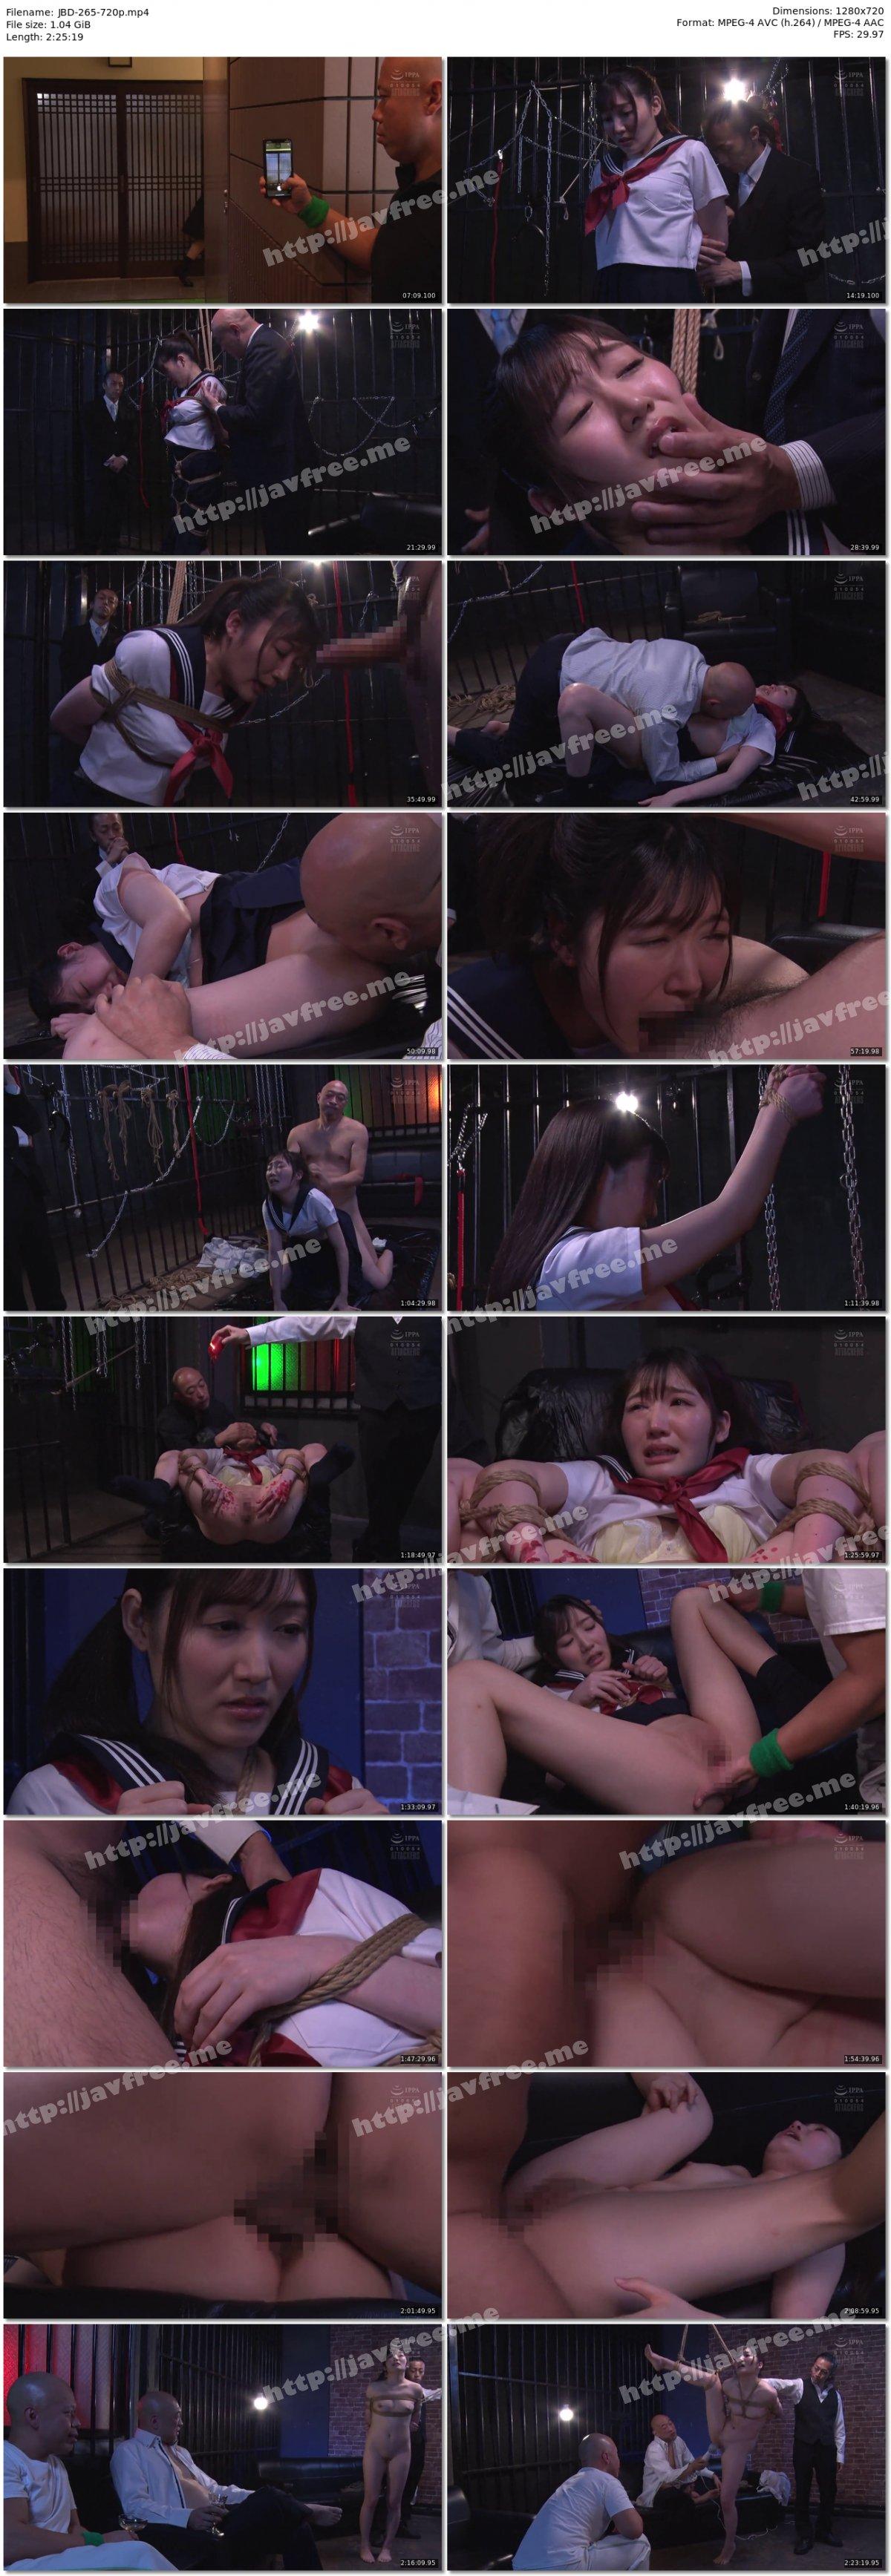 [HD][JBD-265] 女子●生 蛇縛輪●十四 武田エレナ - image JBD-265-720p on https://javfree.me